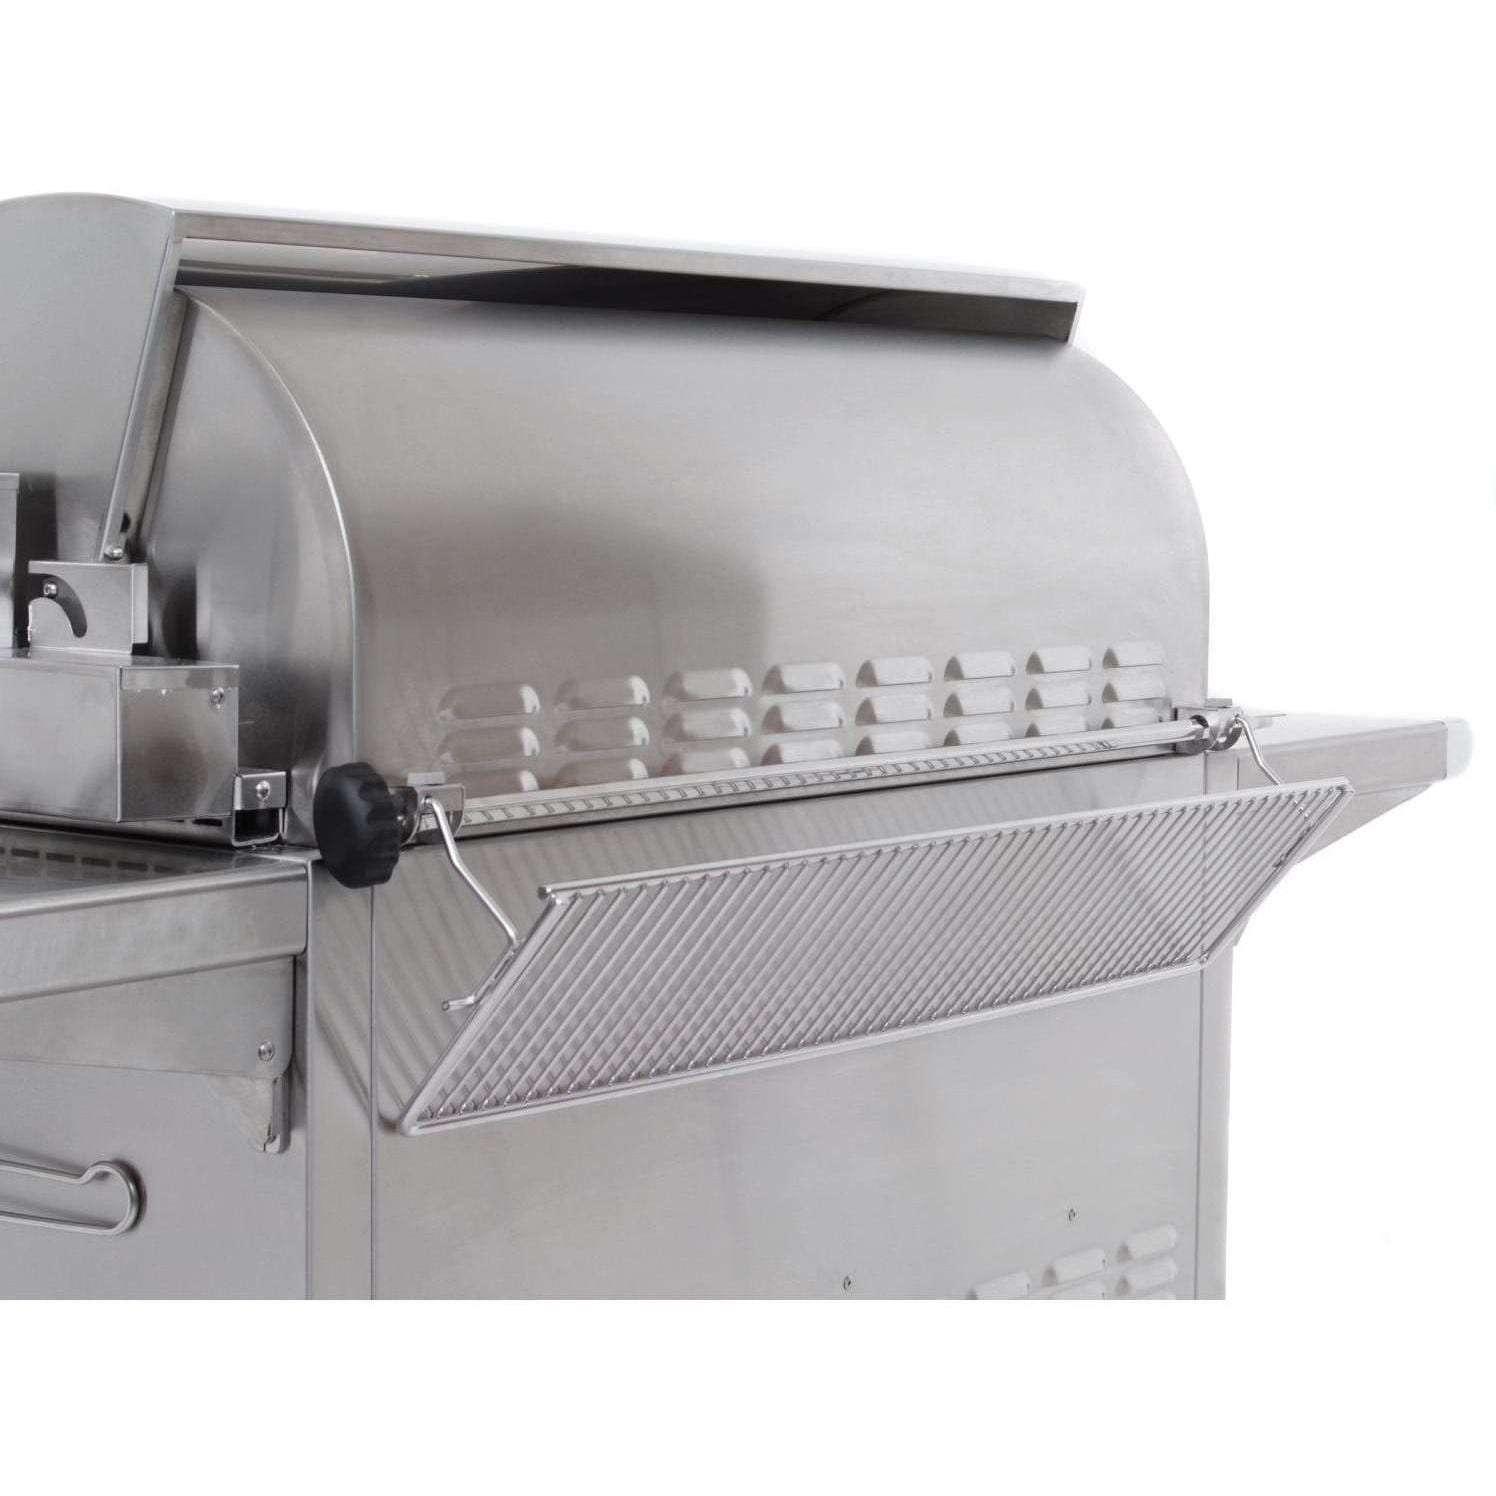 Fire Magic Echelon Diamond E1060s Gas Grill - Warming Rack and Rotisserie Spit Rod Storage Area